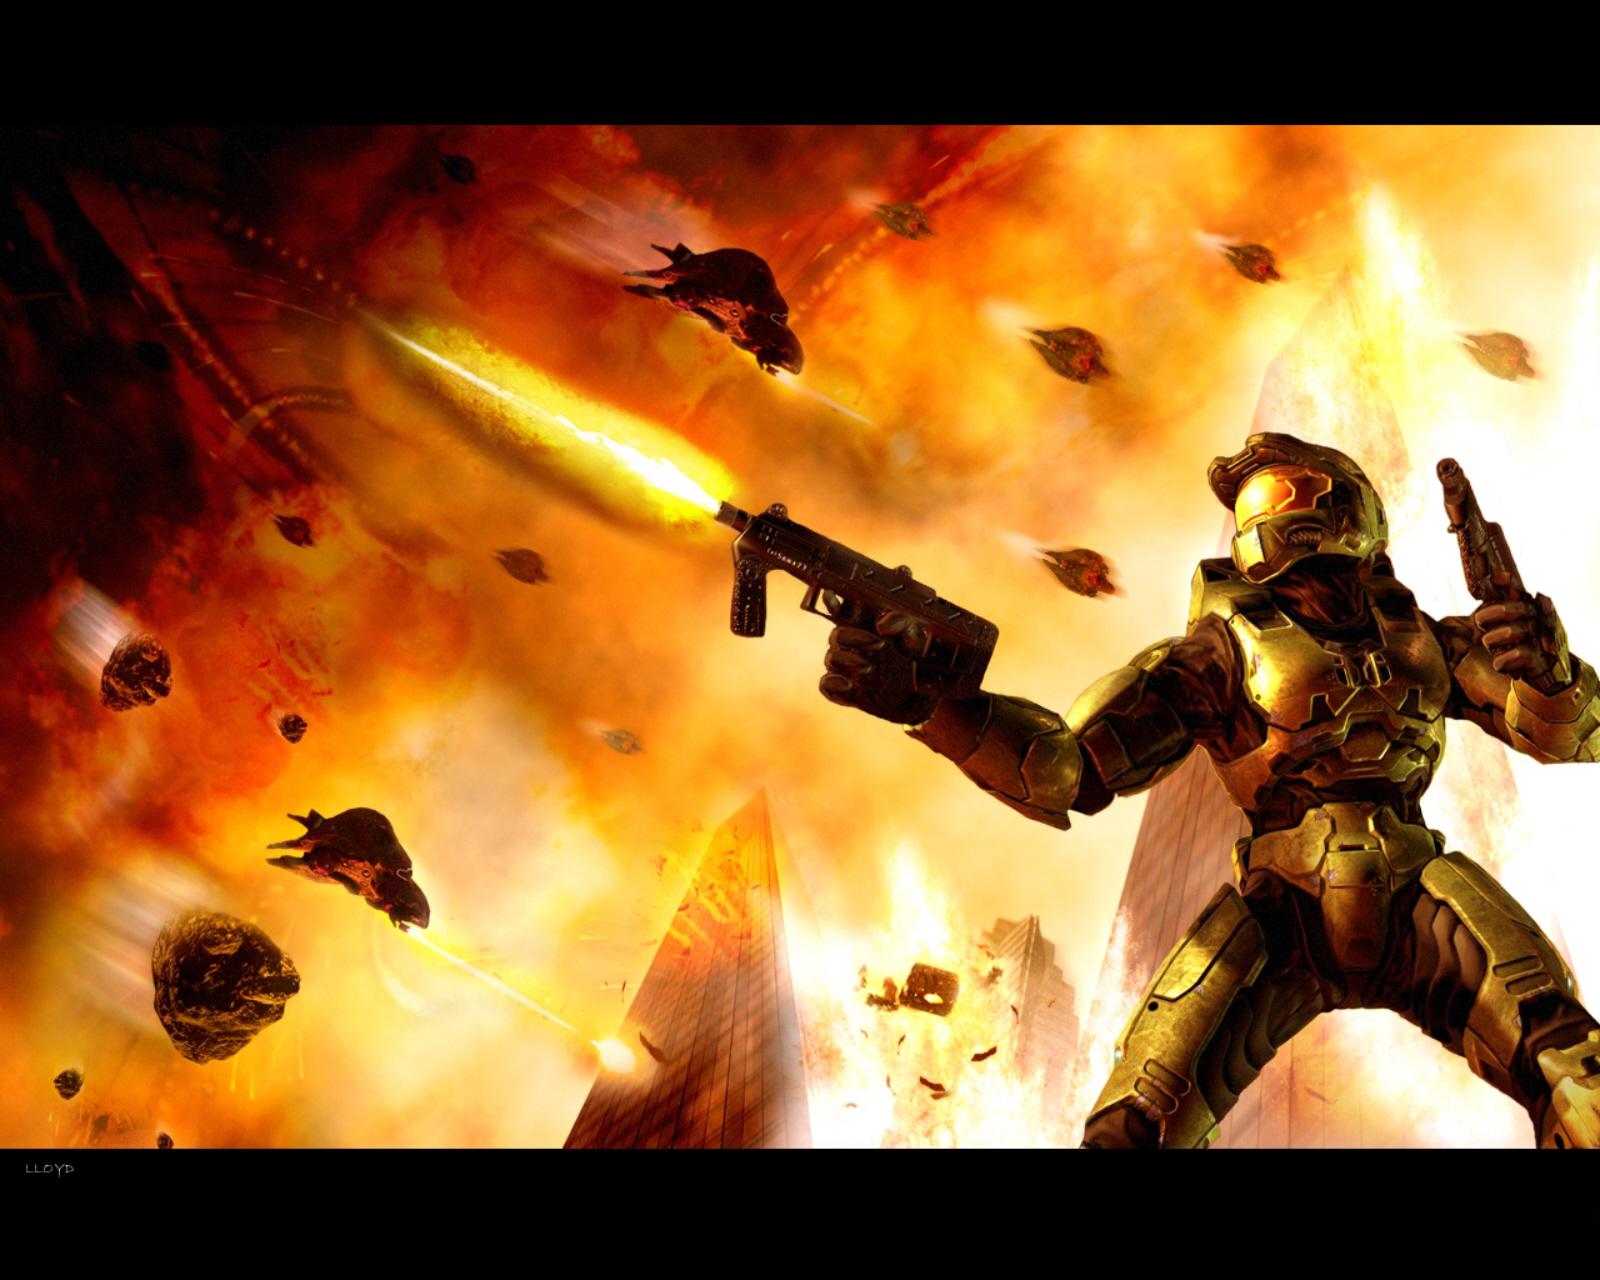 gears of war watch us play games